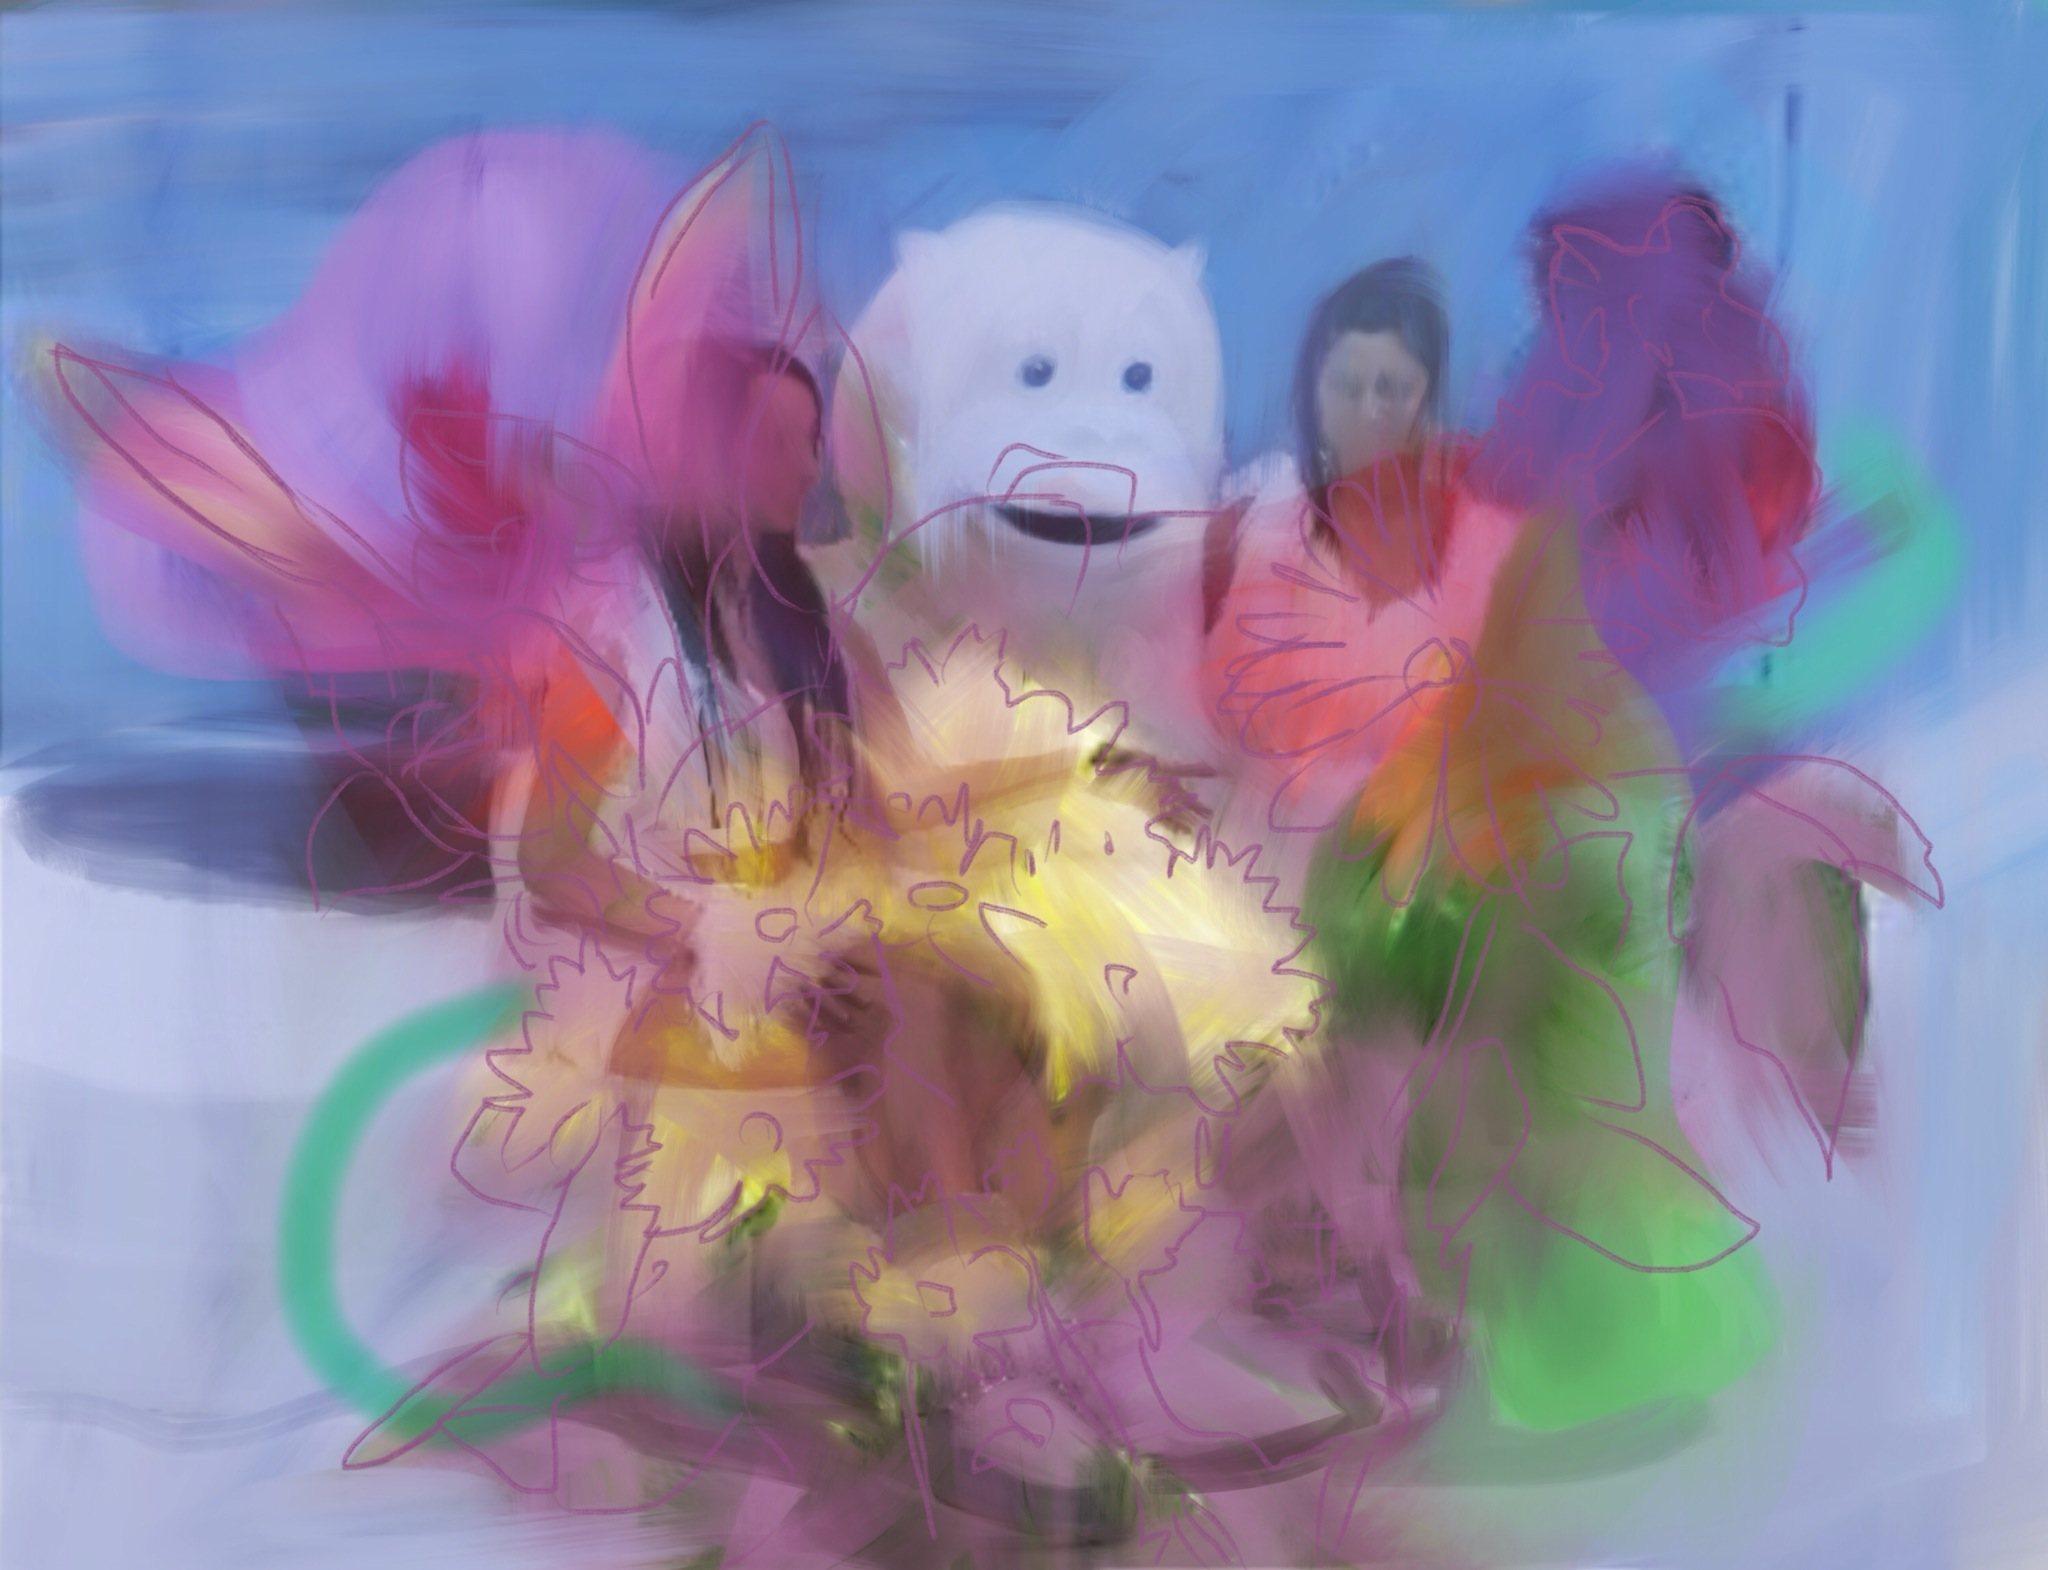 le bouquet, acrylic on canvas, 80x120cm